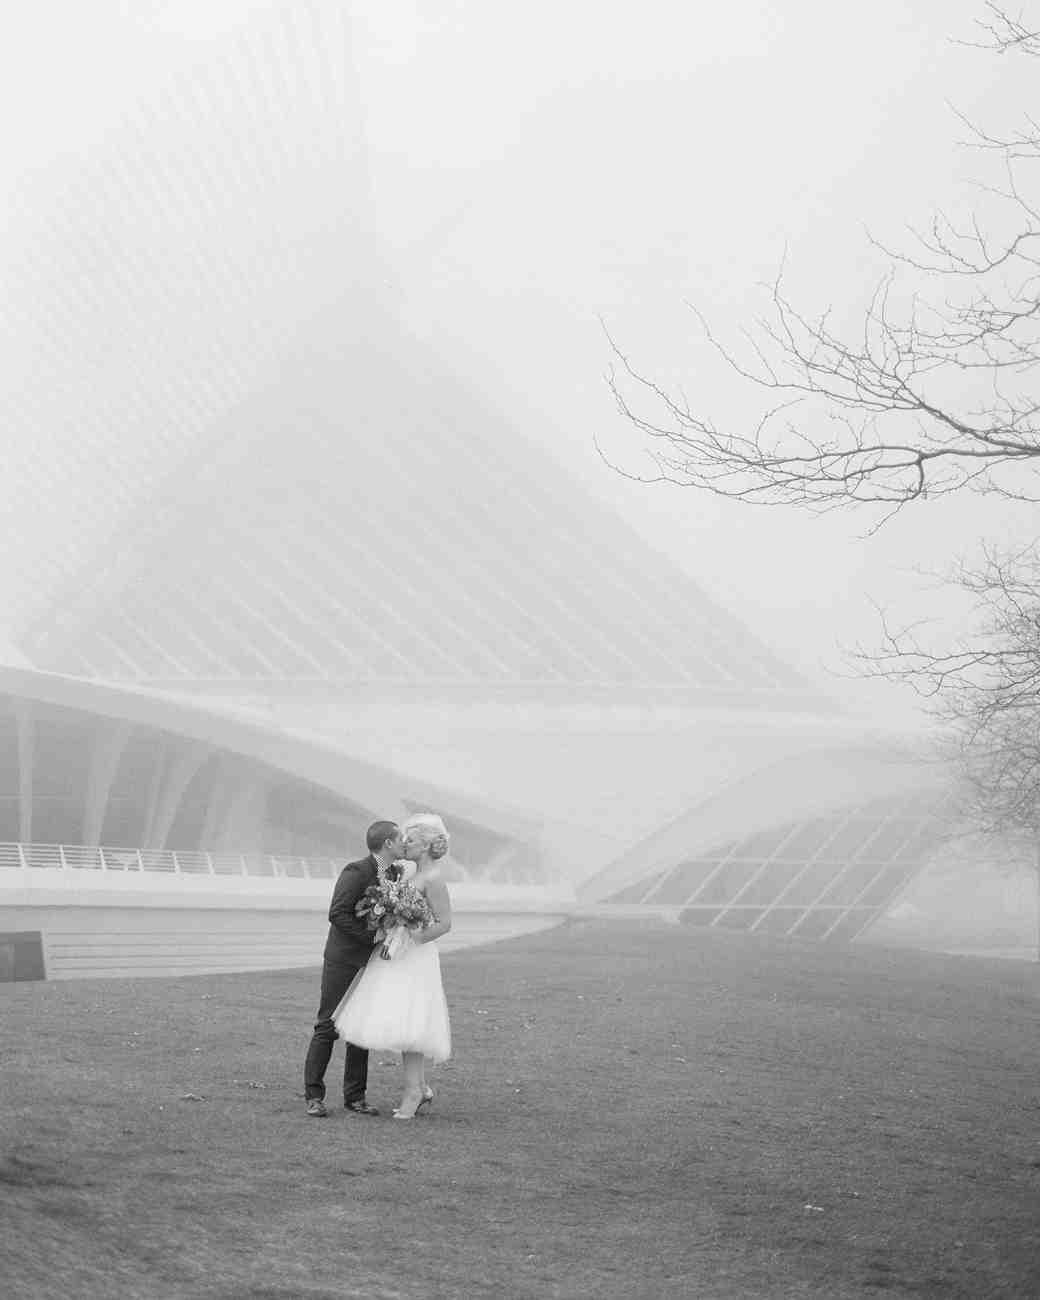 libby-allen-wedding-couple-069-s112487-0116.jpg